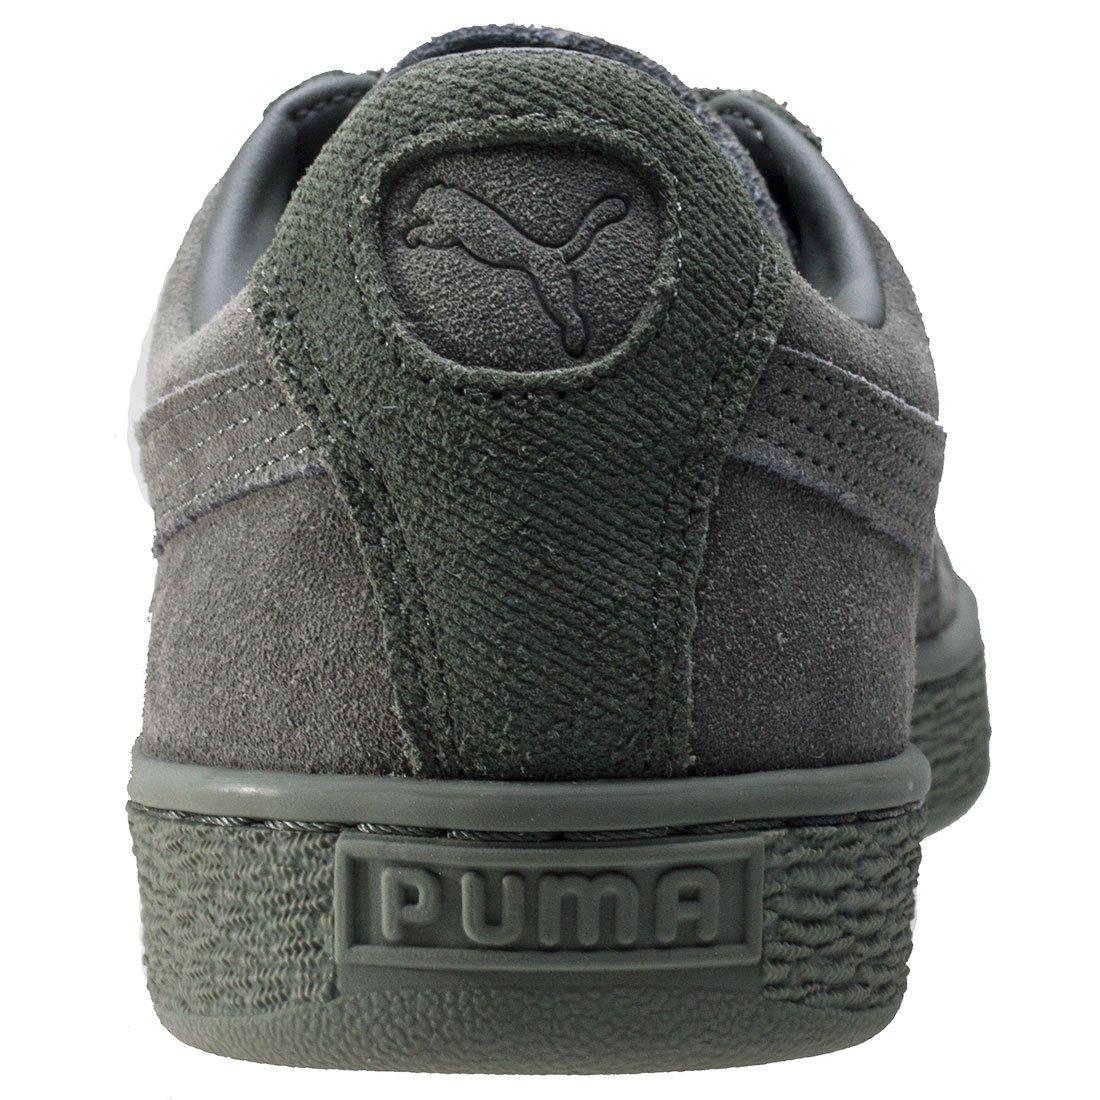 Et Classic Tonal 36259501 Suede Basket Sacs Puma Chaussures YFSwAqq